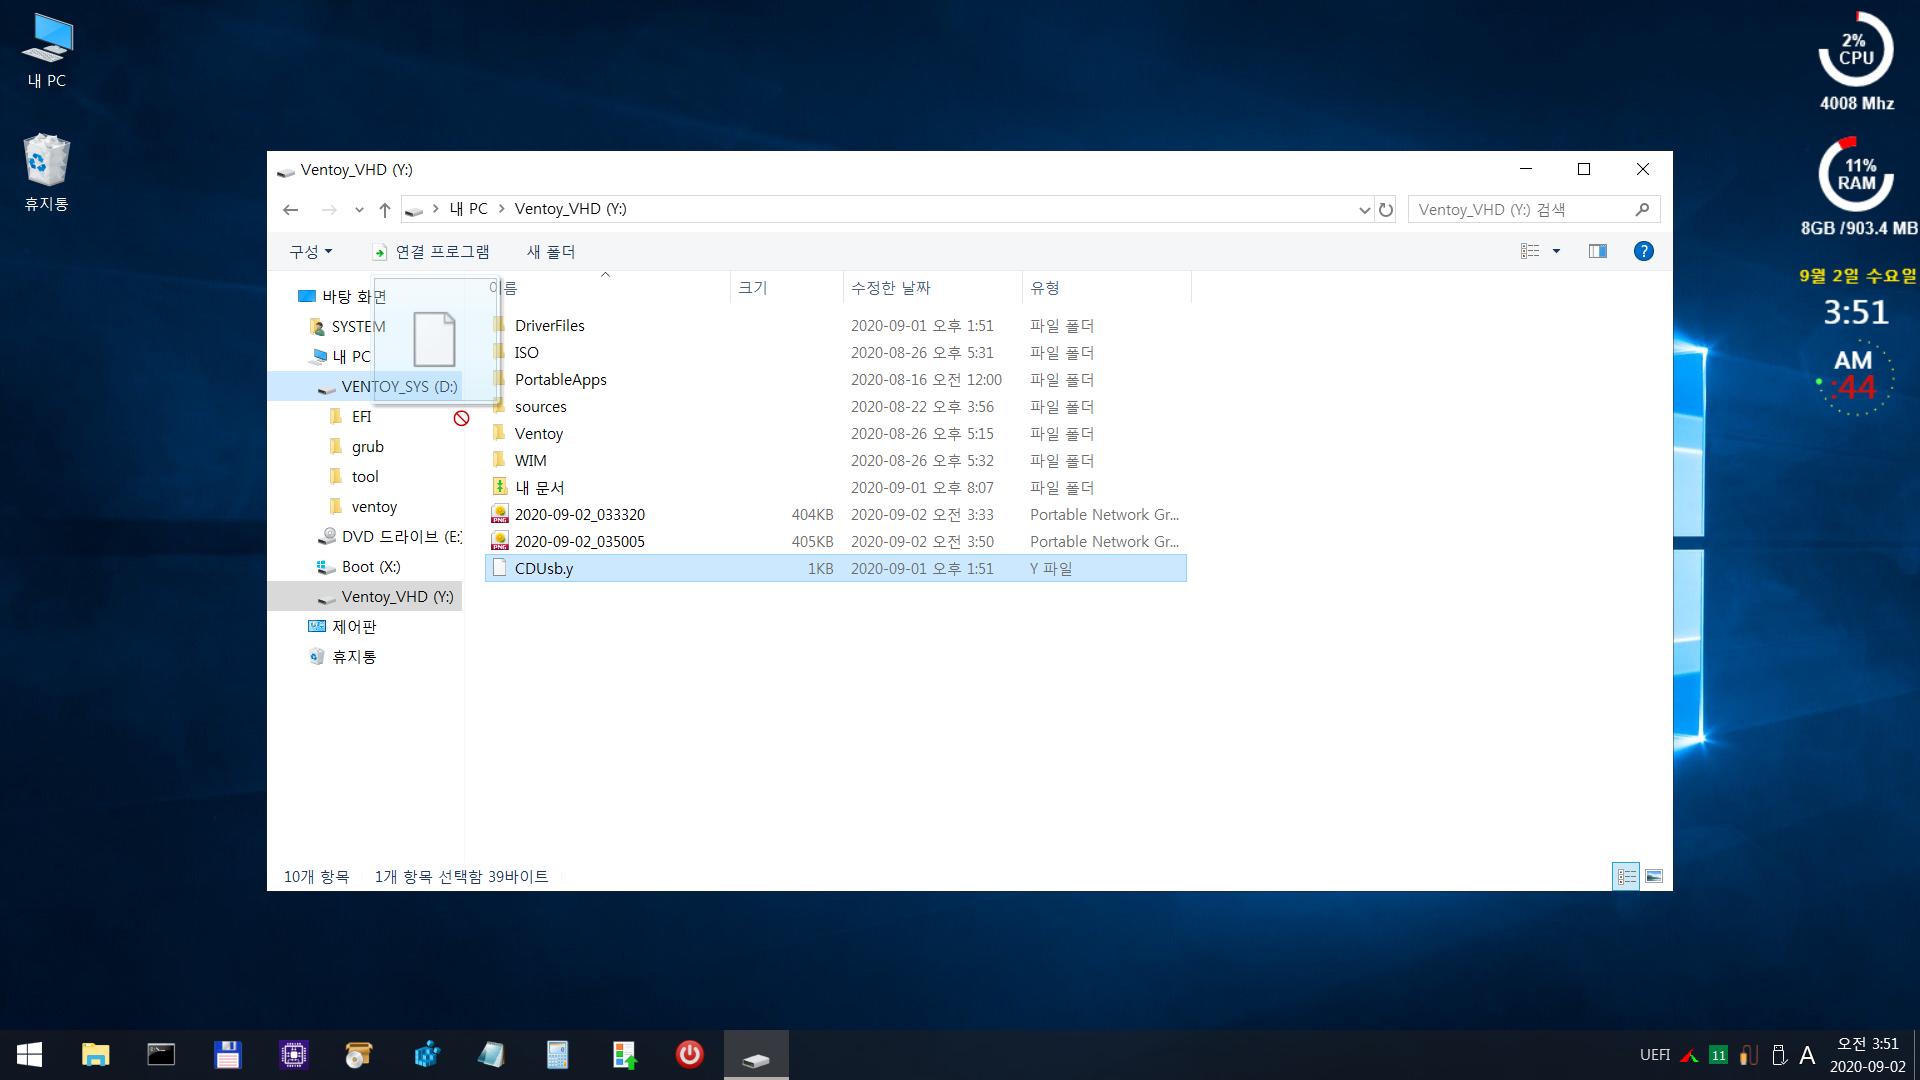 prince pe에 레지스트리 하이브 파일 추가 + 용량 최적화 - Ventoy에 wim 부팅하여 드래그 복사 테스트 - 기존 wim 파일 2020-09-02_035146.png